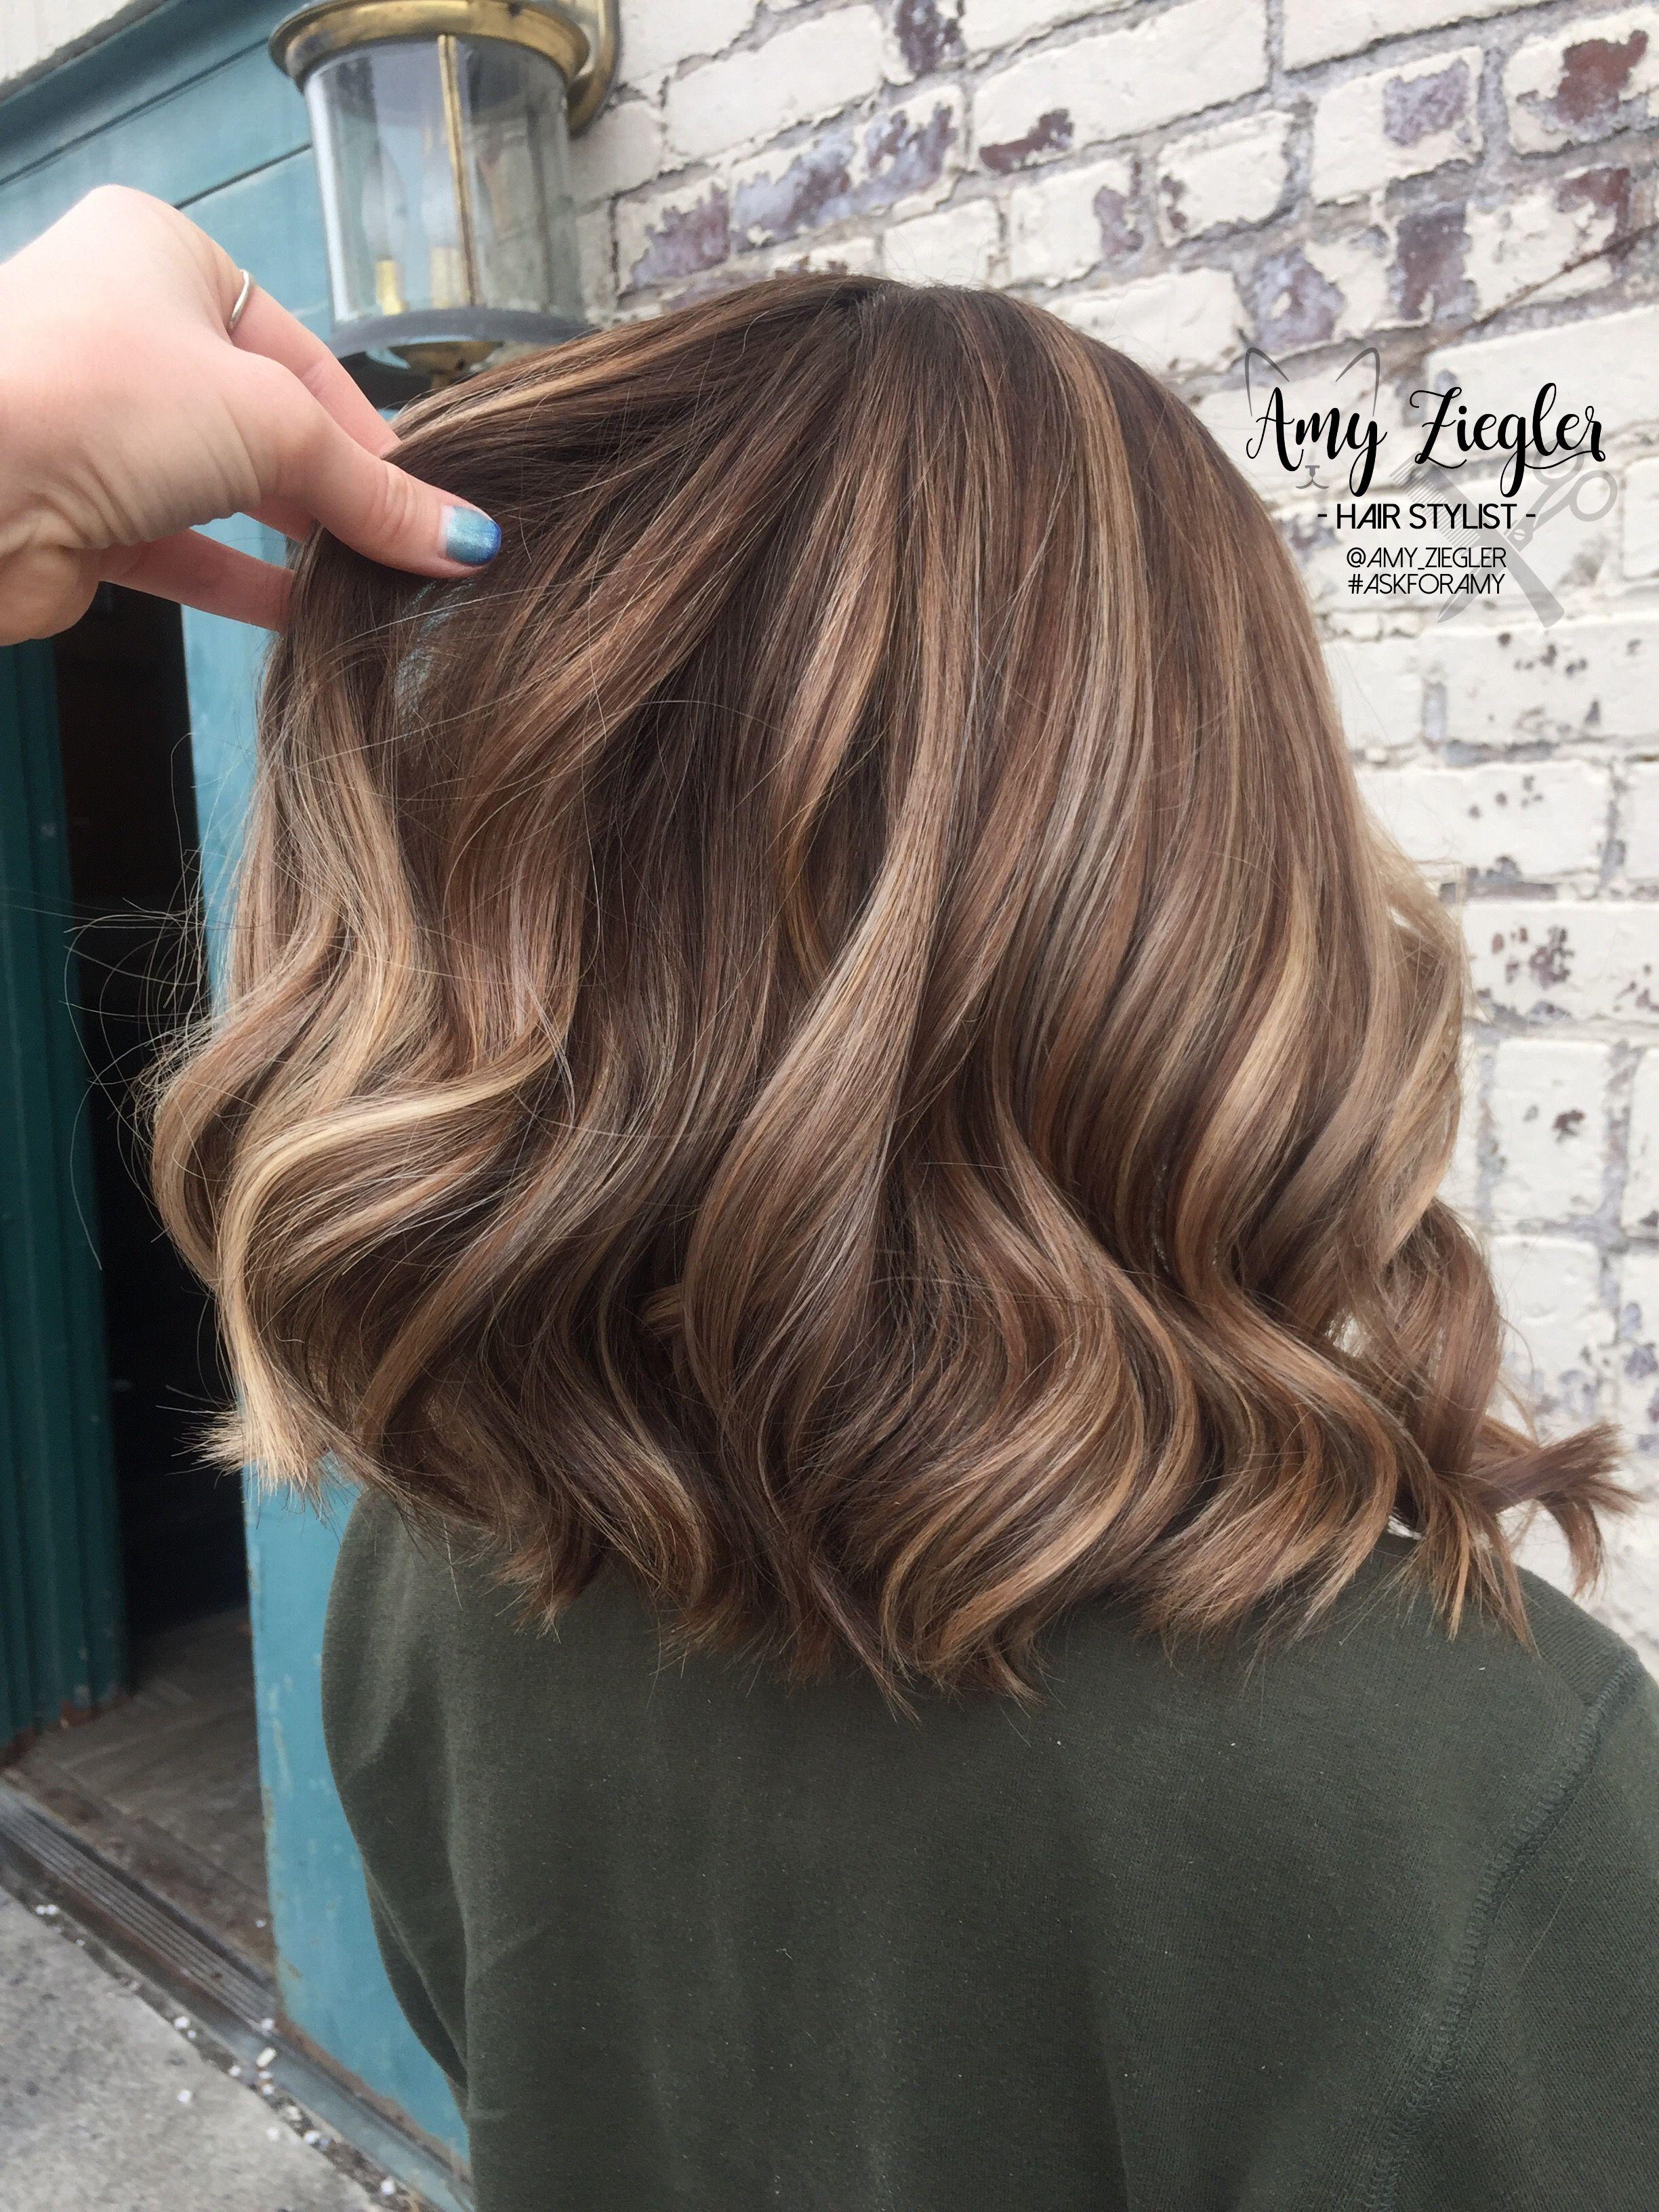 Brunette Blonde Balayage And Lowlights By Amy Ziegler